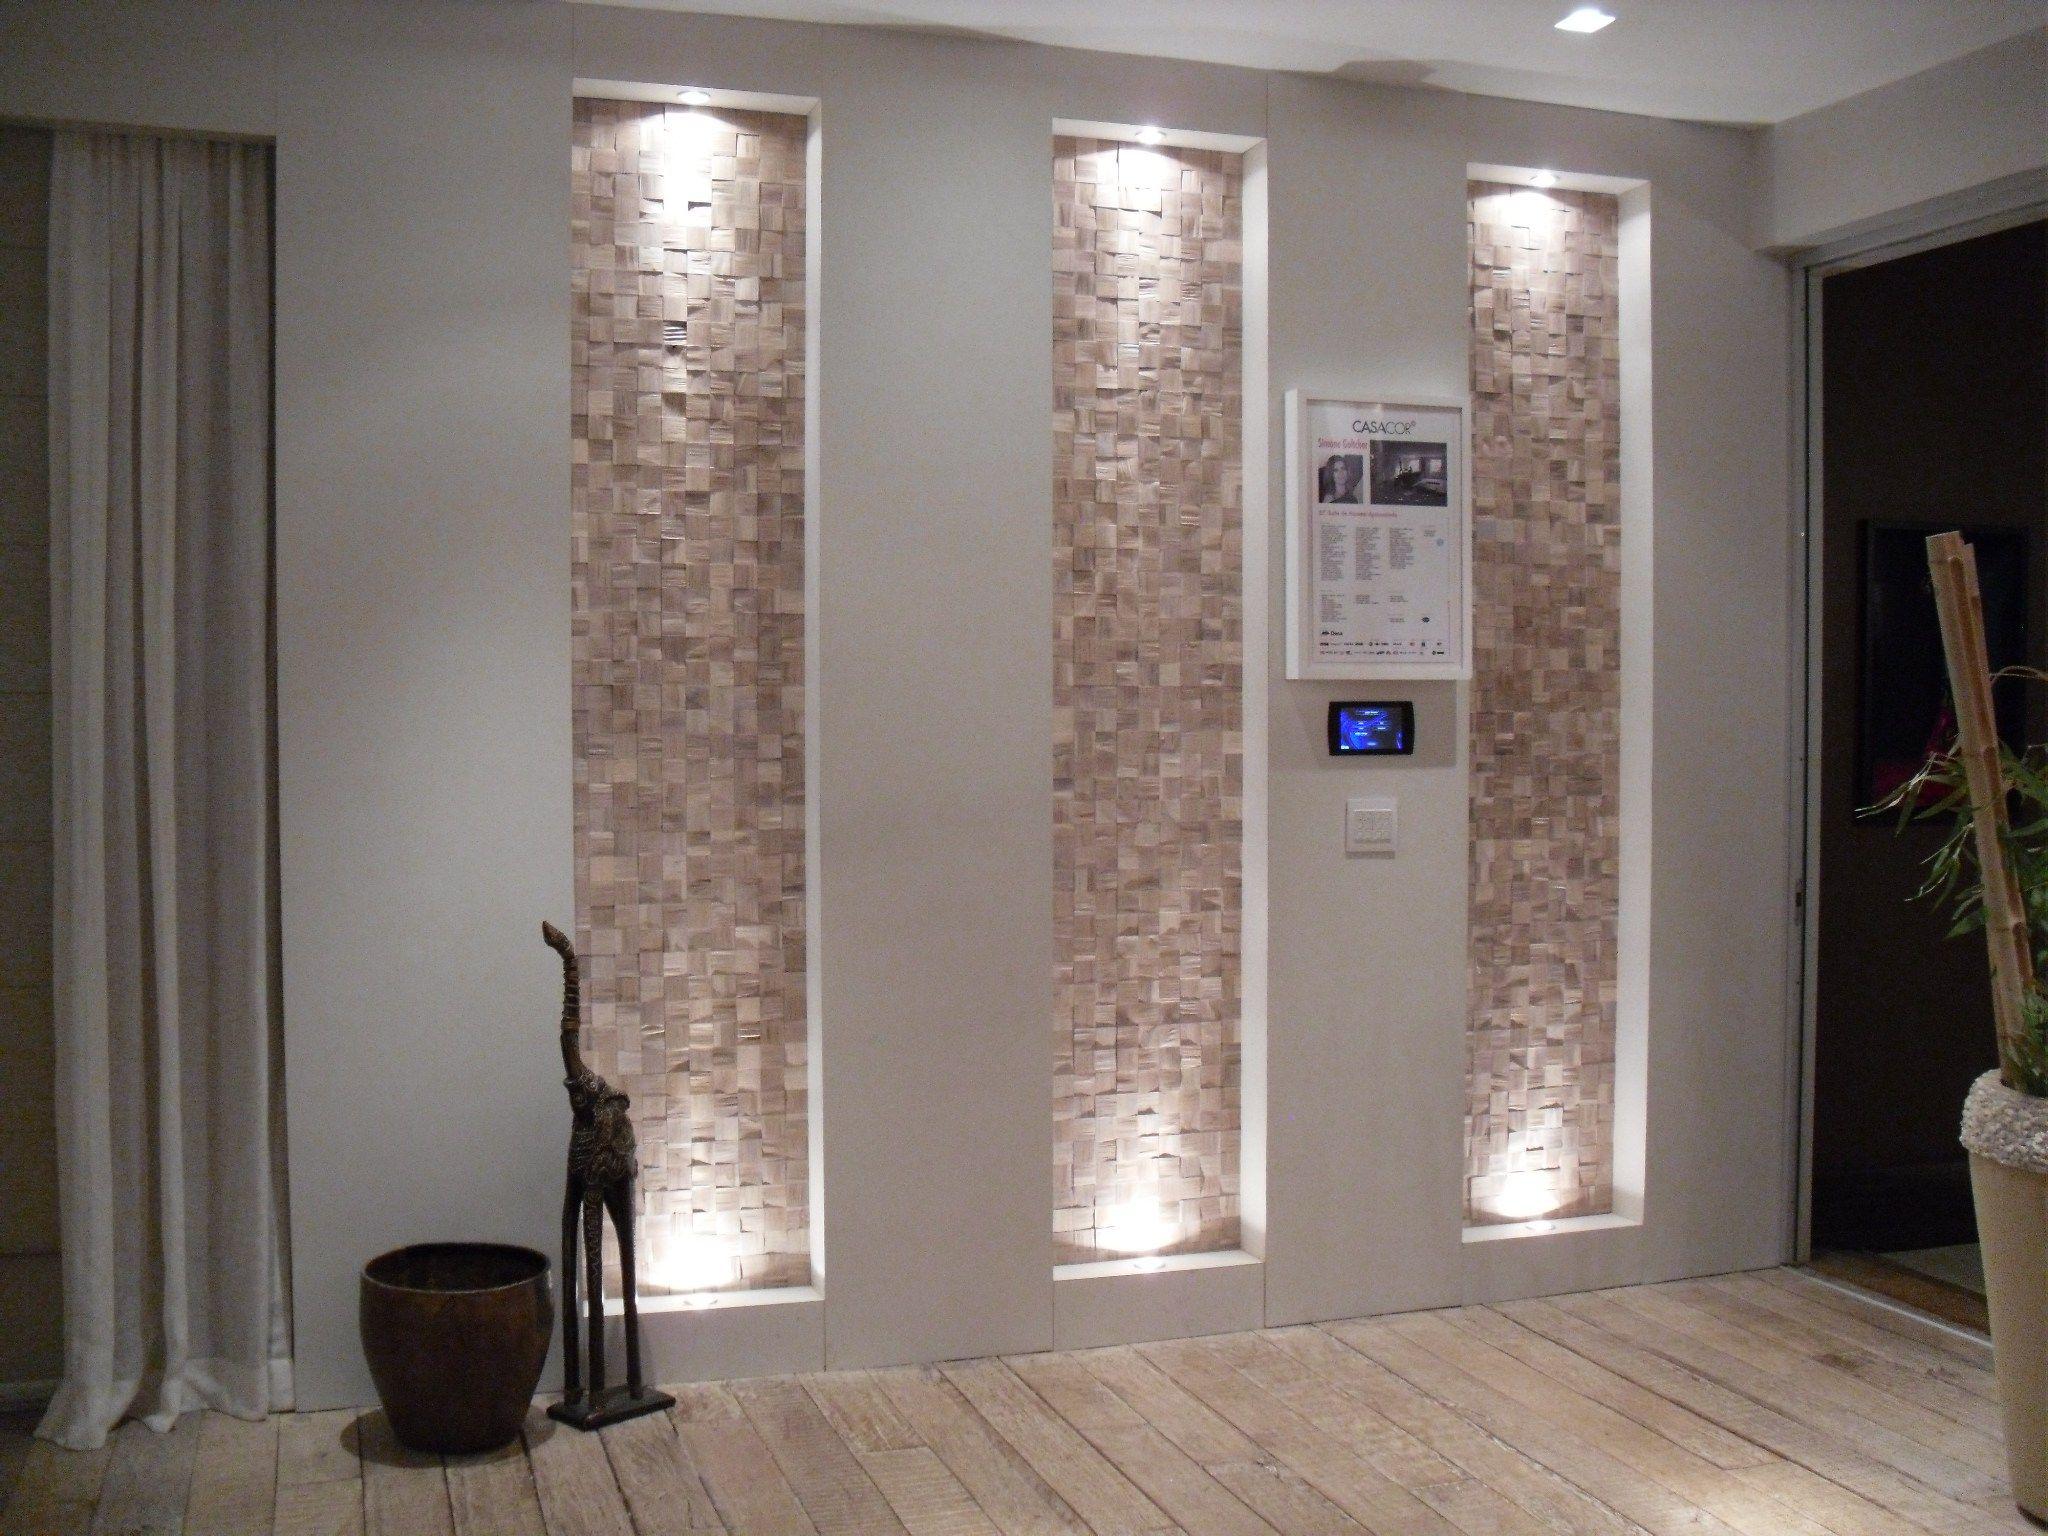 Nicho rasgo parede ilumina ao decora ao home pinterest - Iluminacion escaleras interiores ...